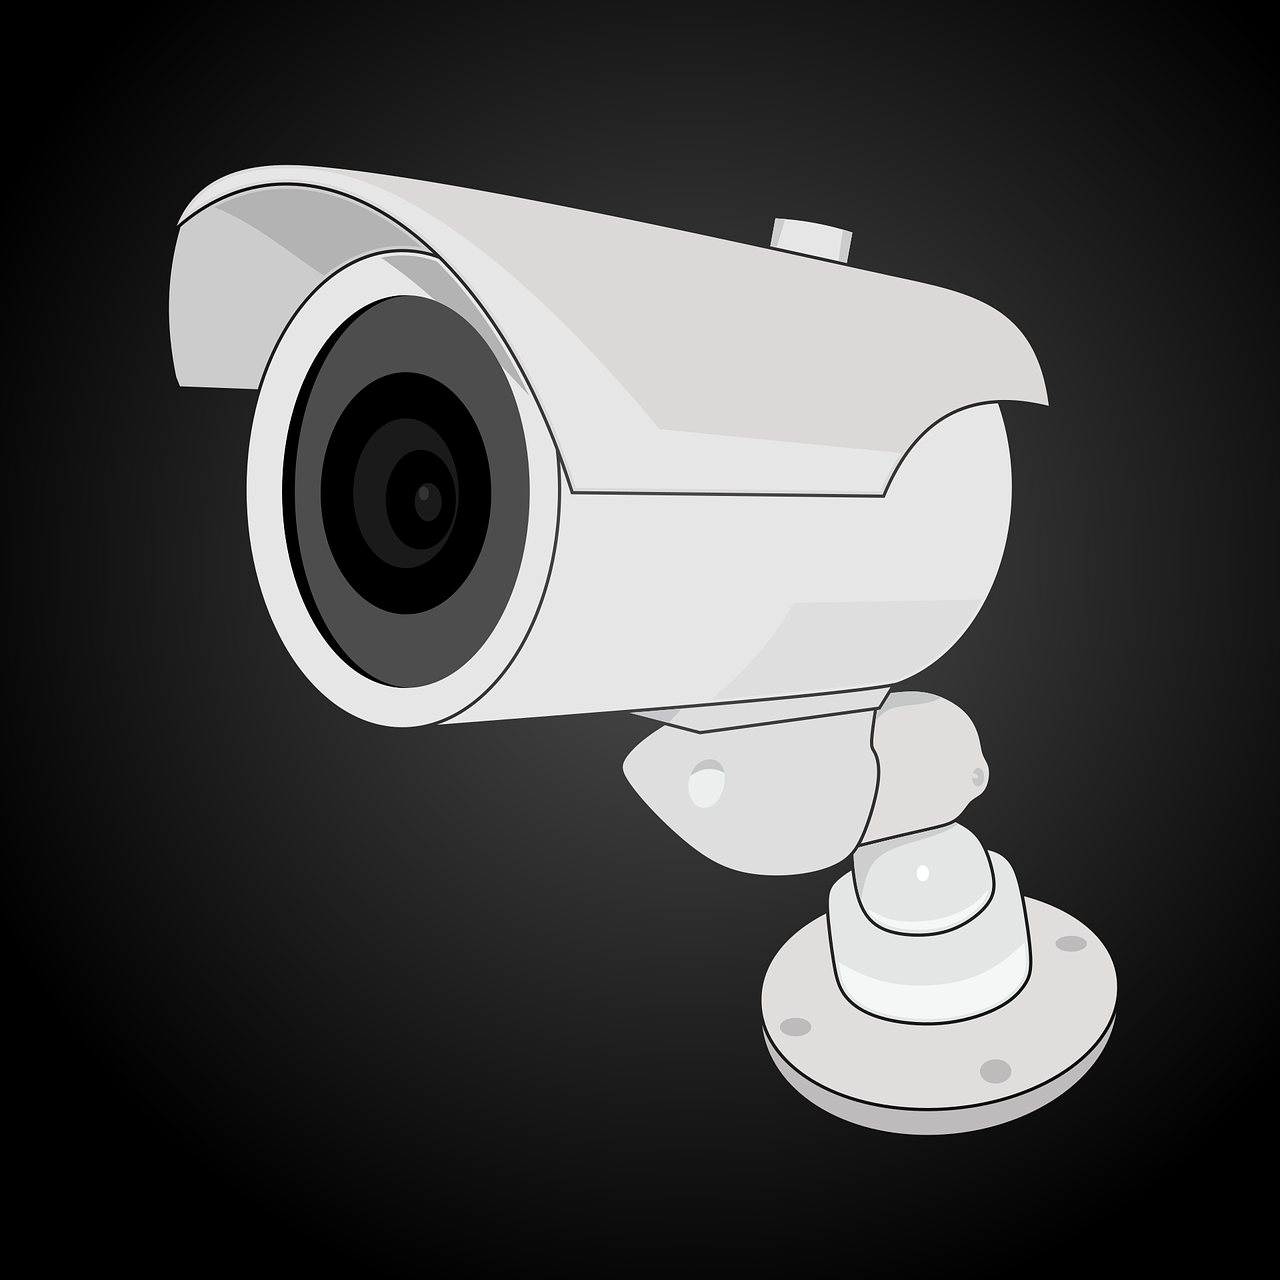 камера картинка для сайта